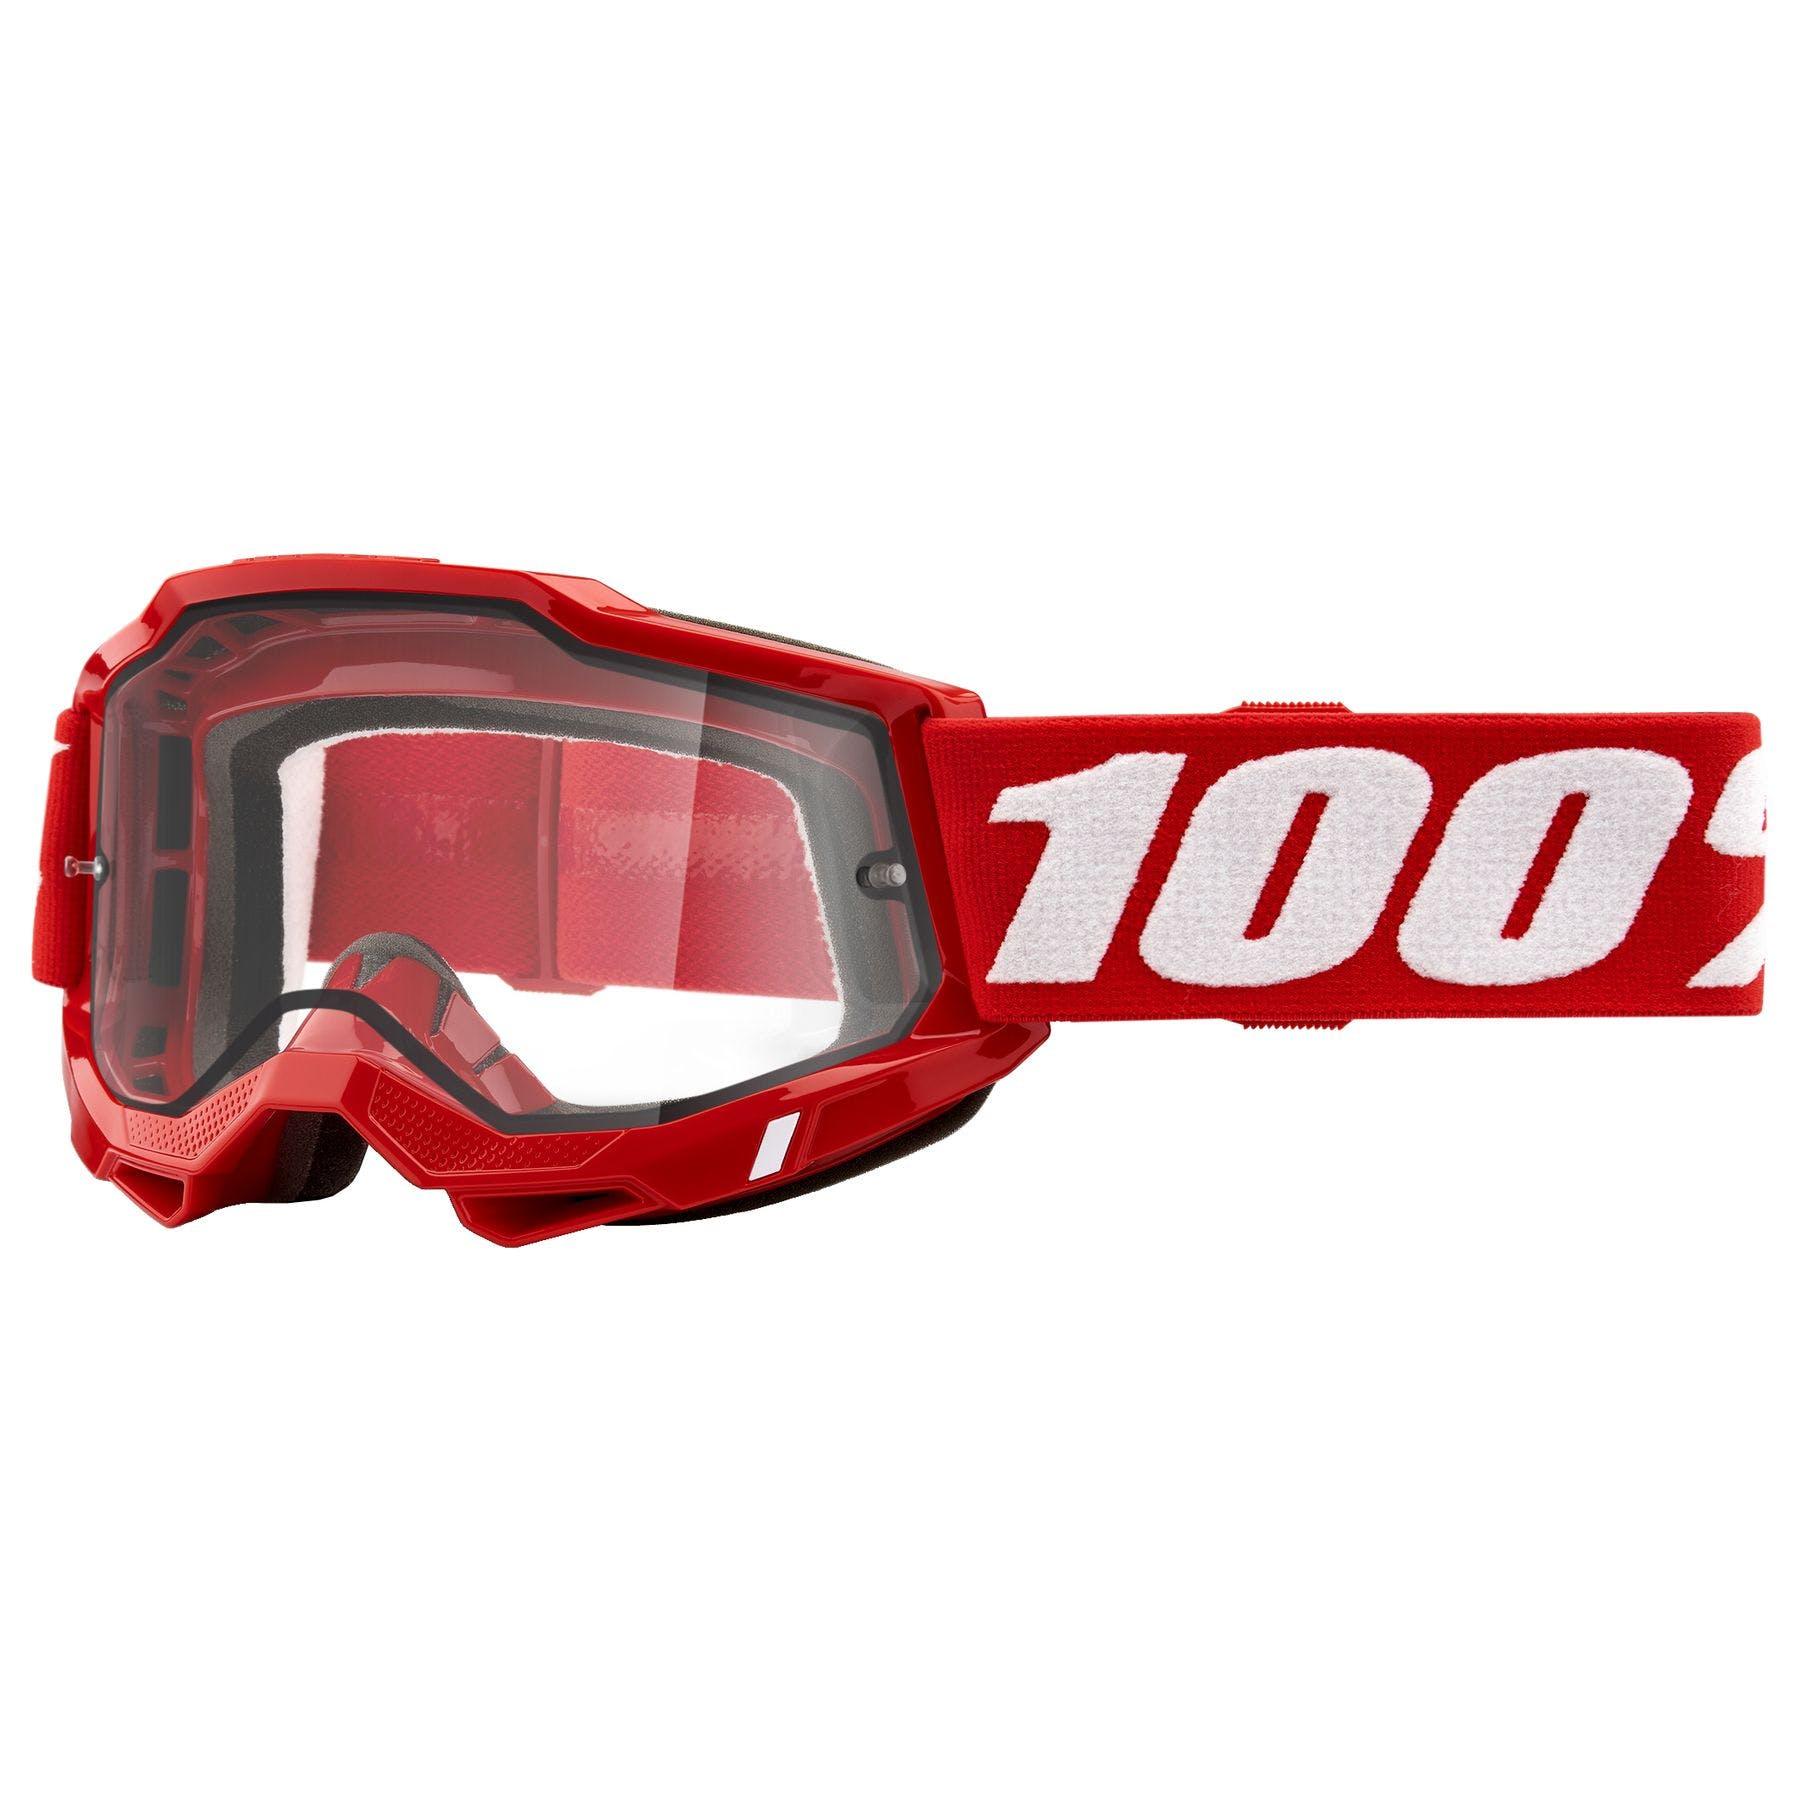 100/% Accuri Mens Off-Road//Dirt Bike Motorcycle Goggles Eyewear Black Tornado//Grey Smoke Lens One Size